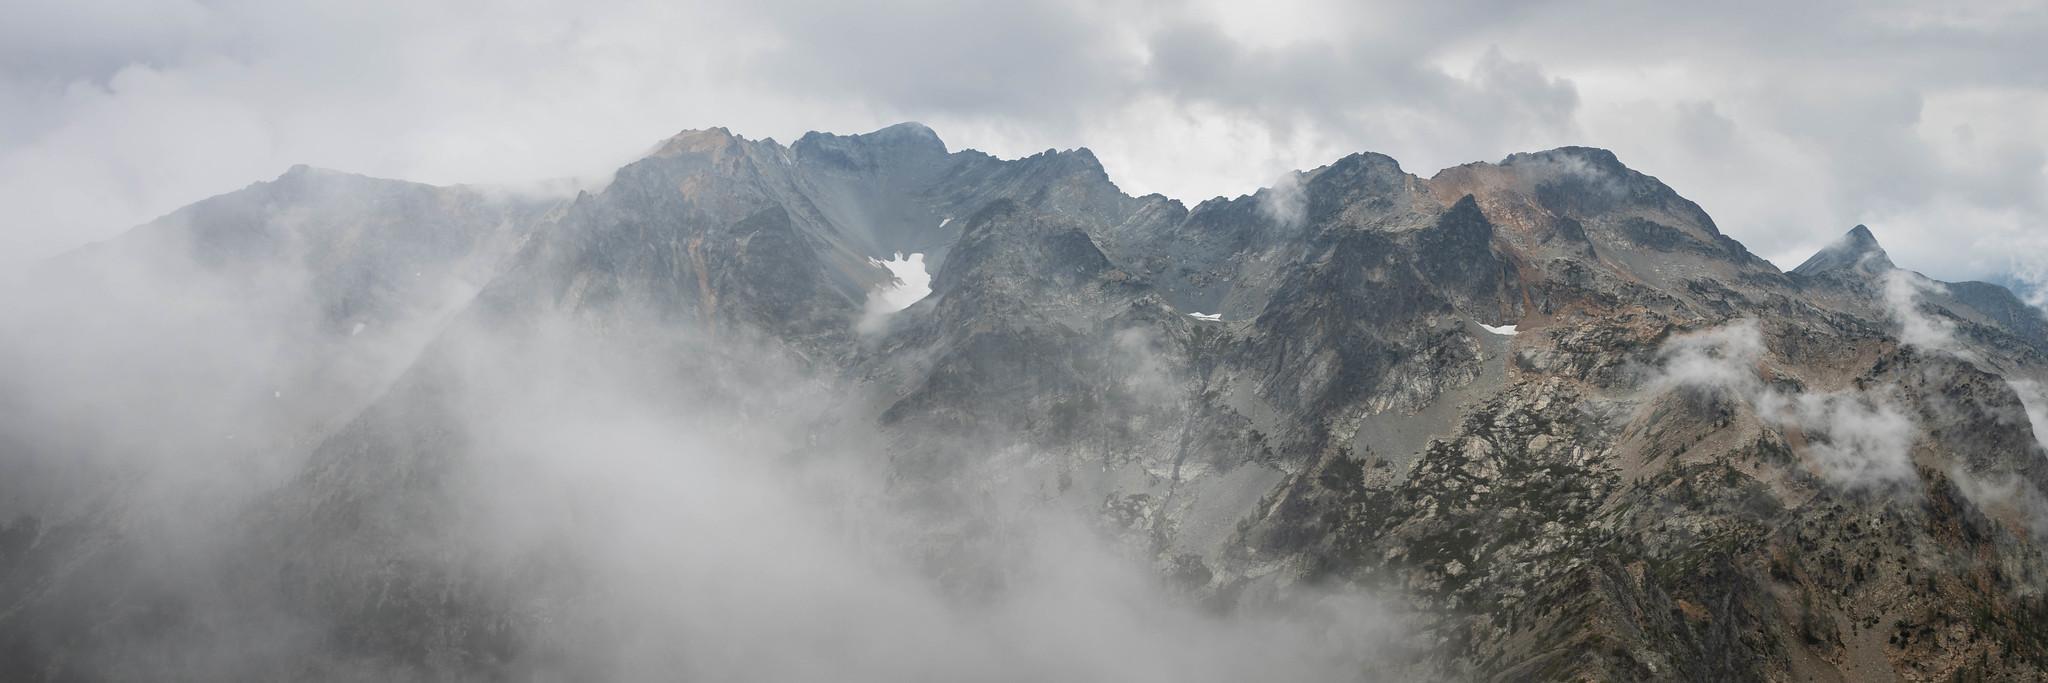 Robinson Mountain panoramic view